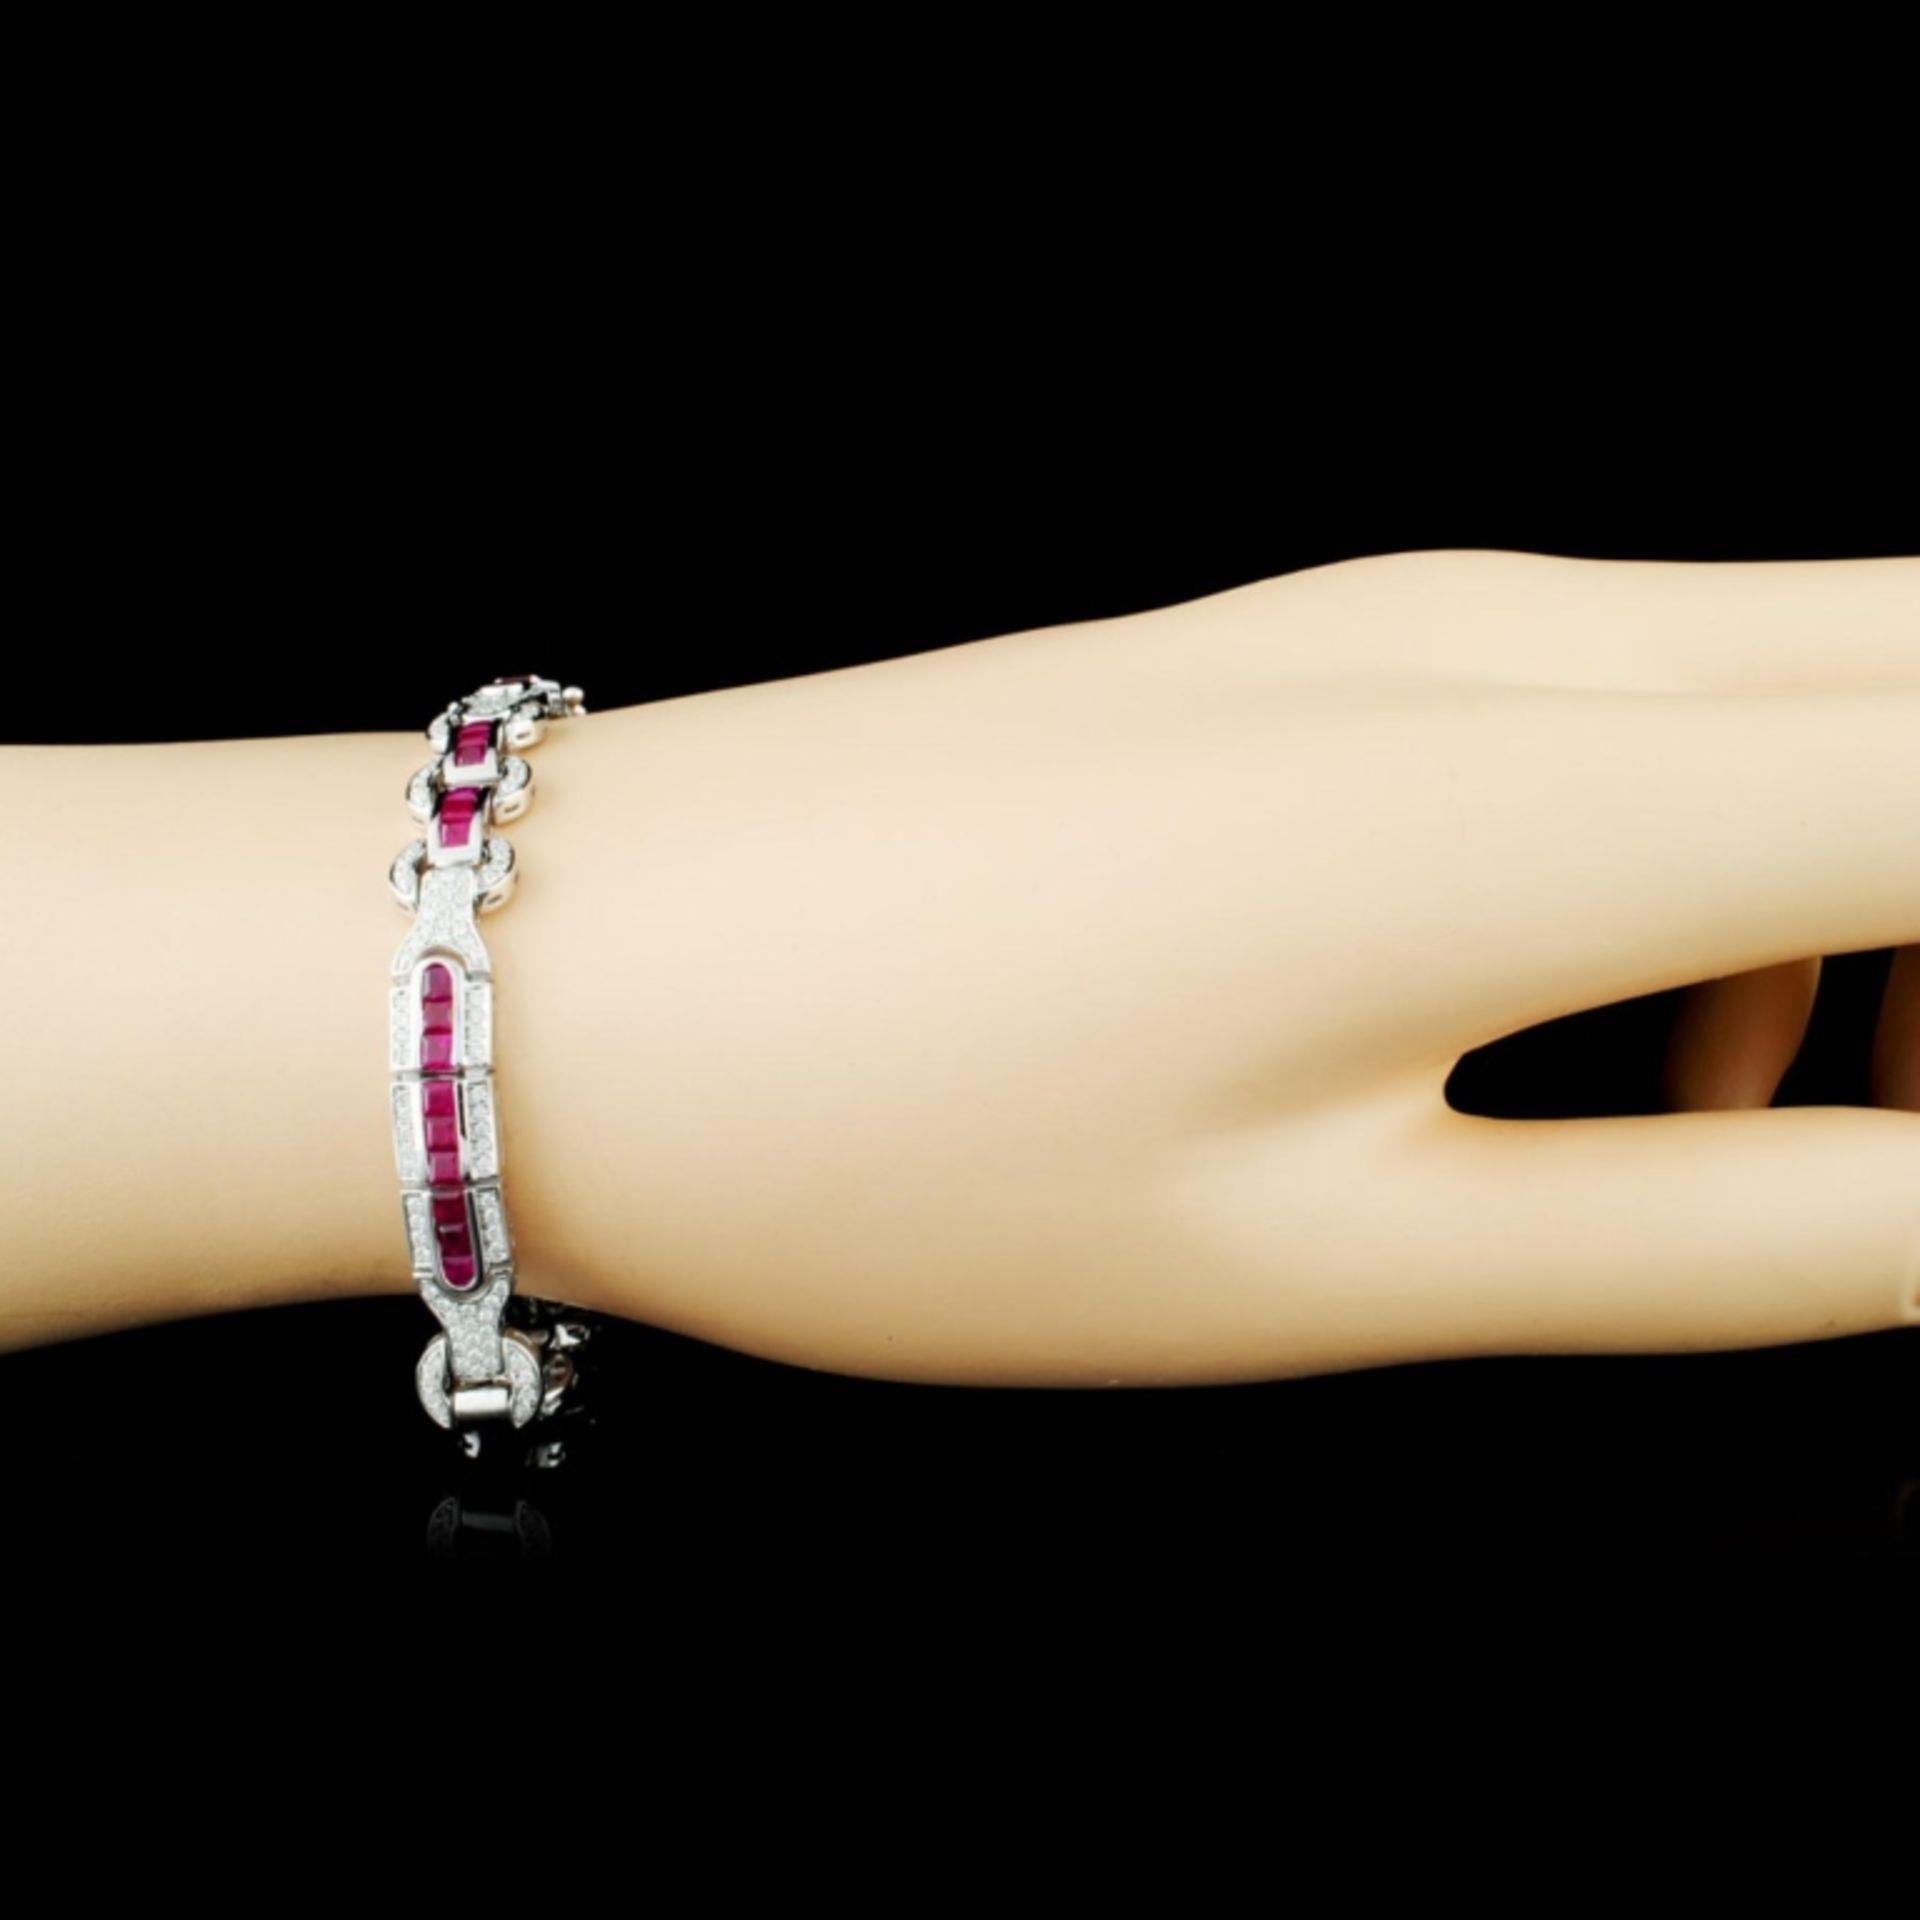 14K Gold 5.12ct Ruby & 1.30ctw Diamond Bracelet - Image 3 of 4